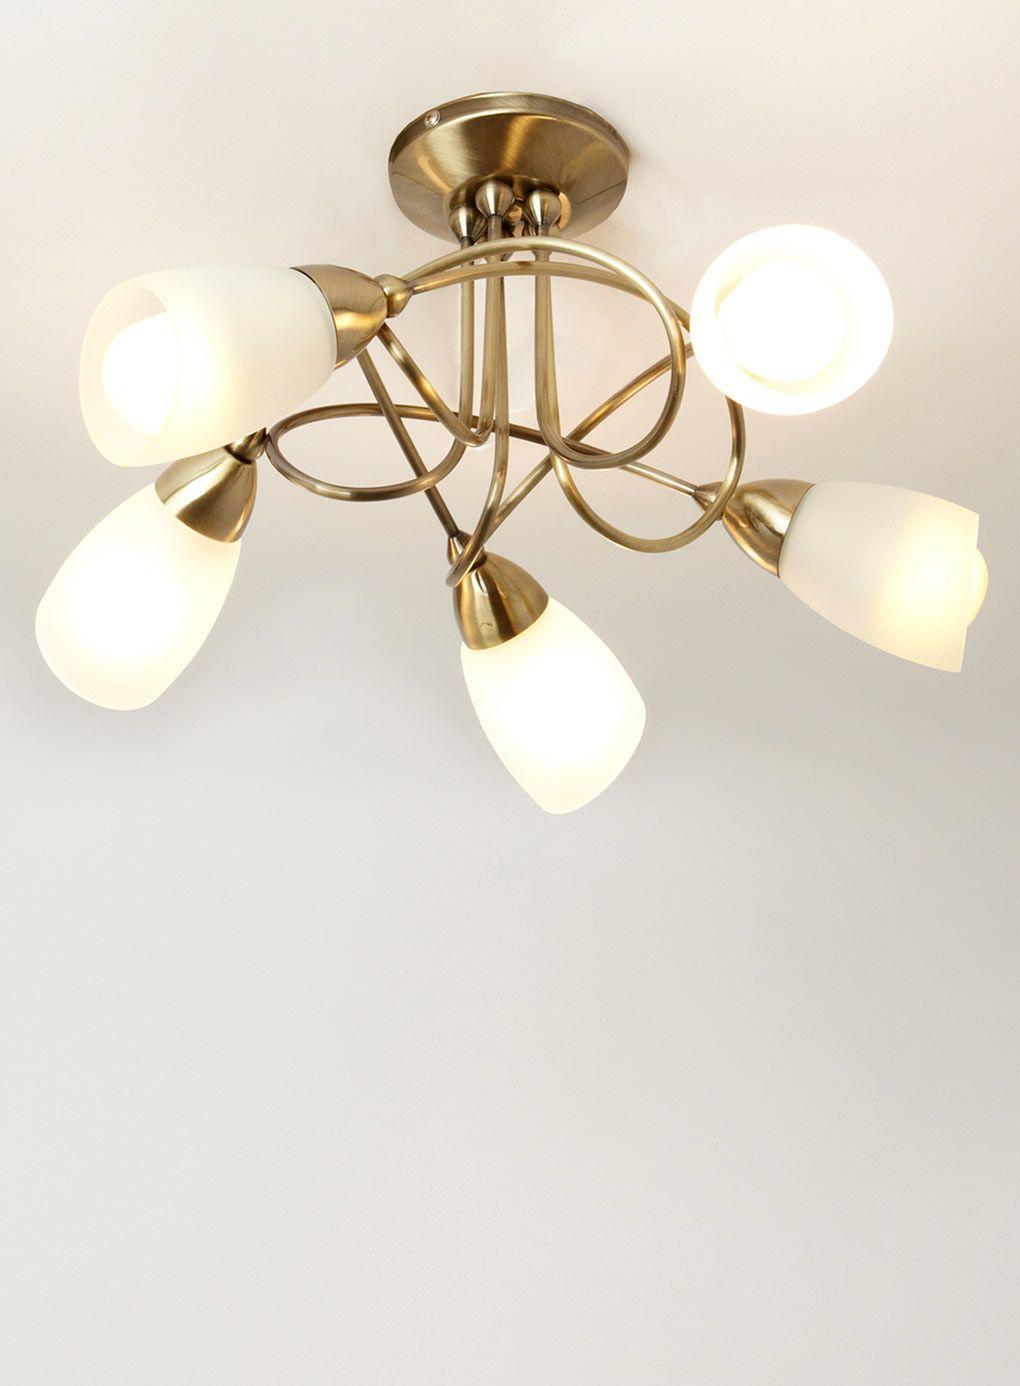 ottoni 5 light ceiling fitting - ceiling lights - home, lighting